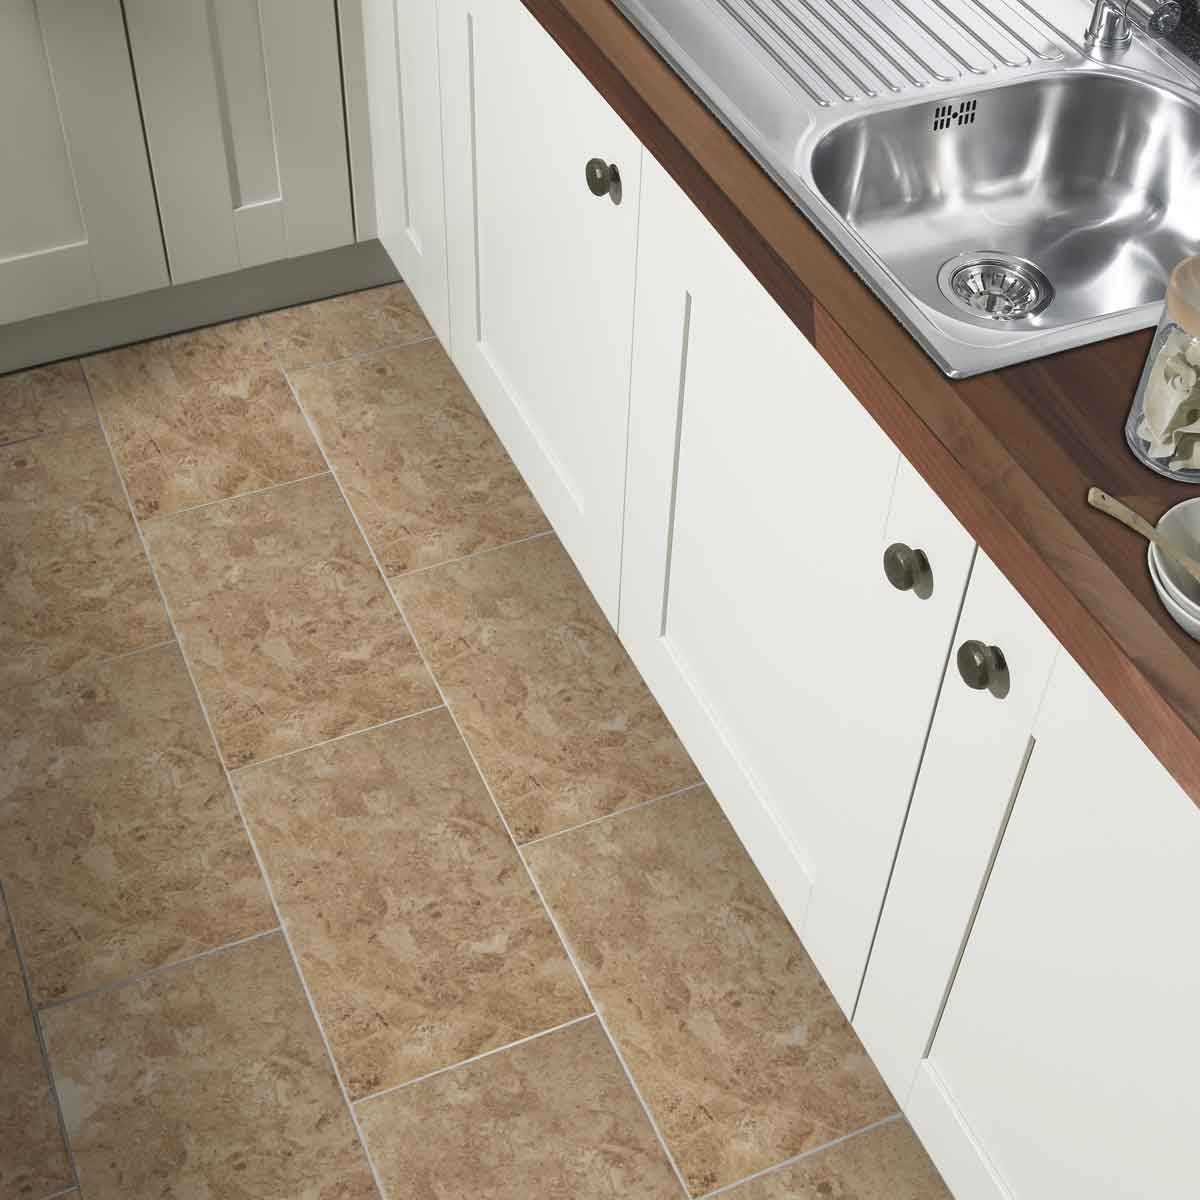 Border tiles get ideas for bathrooms kitchens british ceramic tile dark beige wall floor british ceramic tile cappuccino dailygadgetfo Gallery